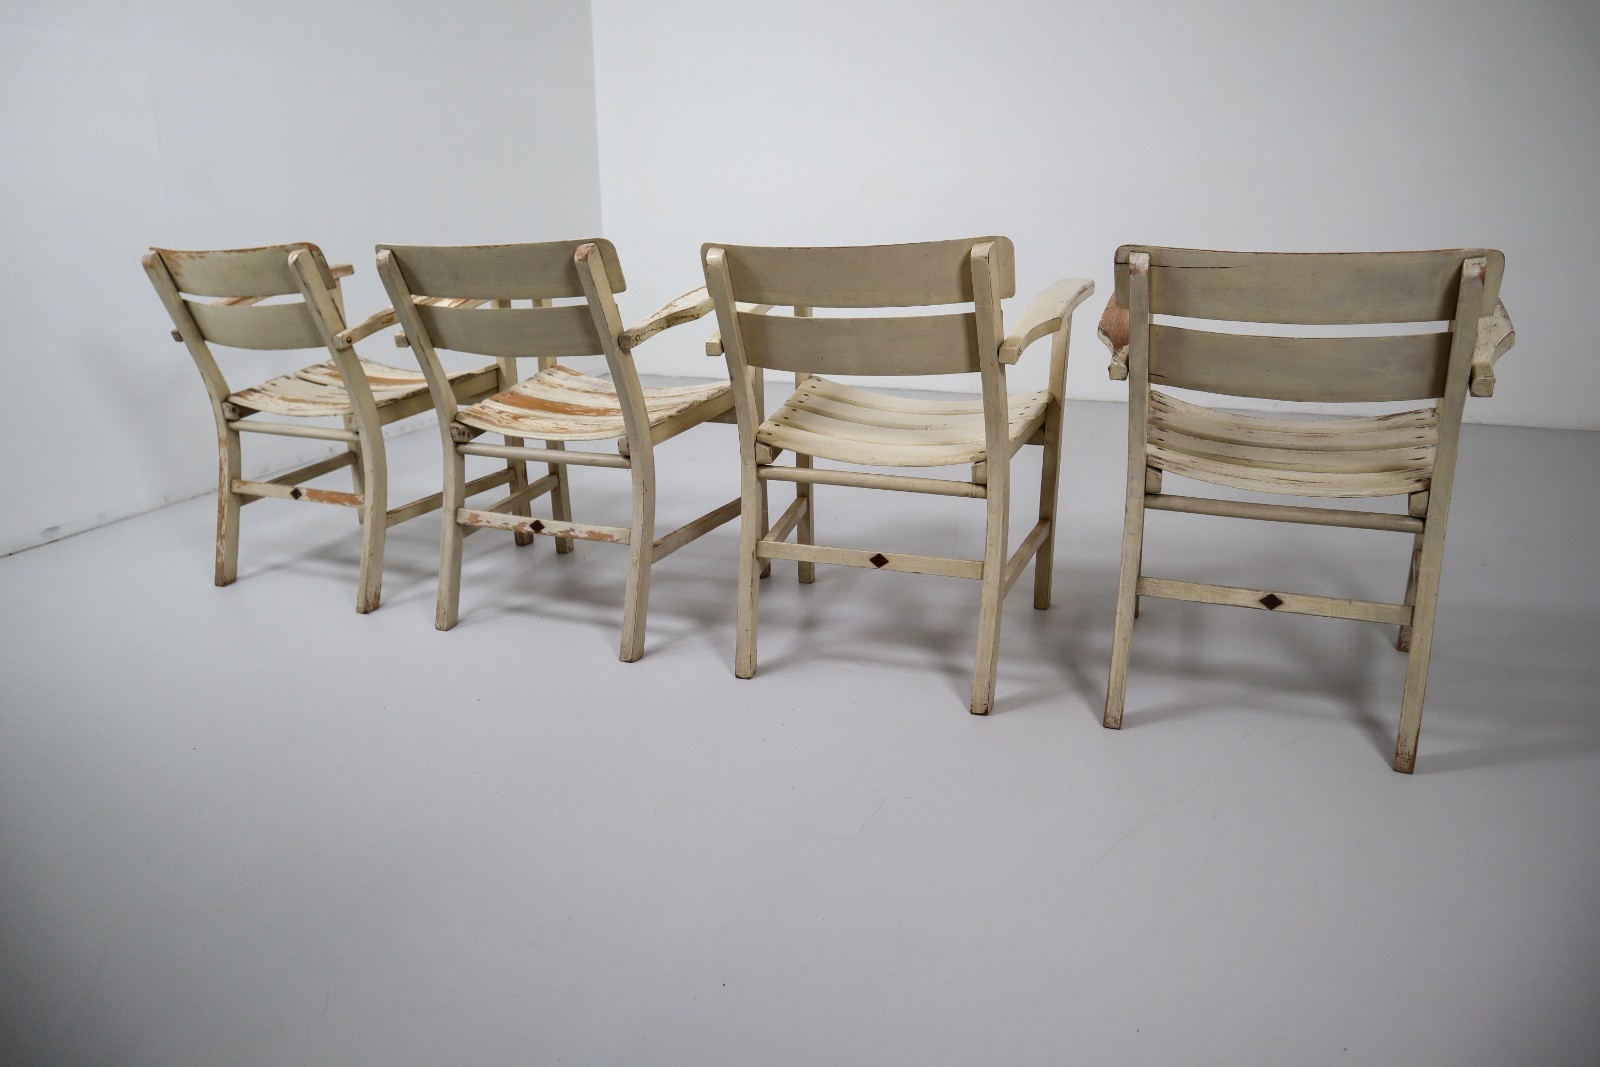 German Garden Patio Set 1930 Chairs